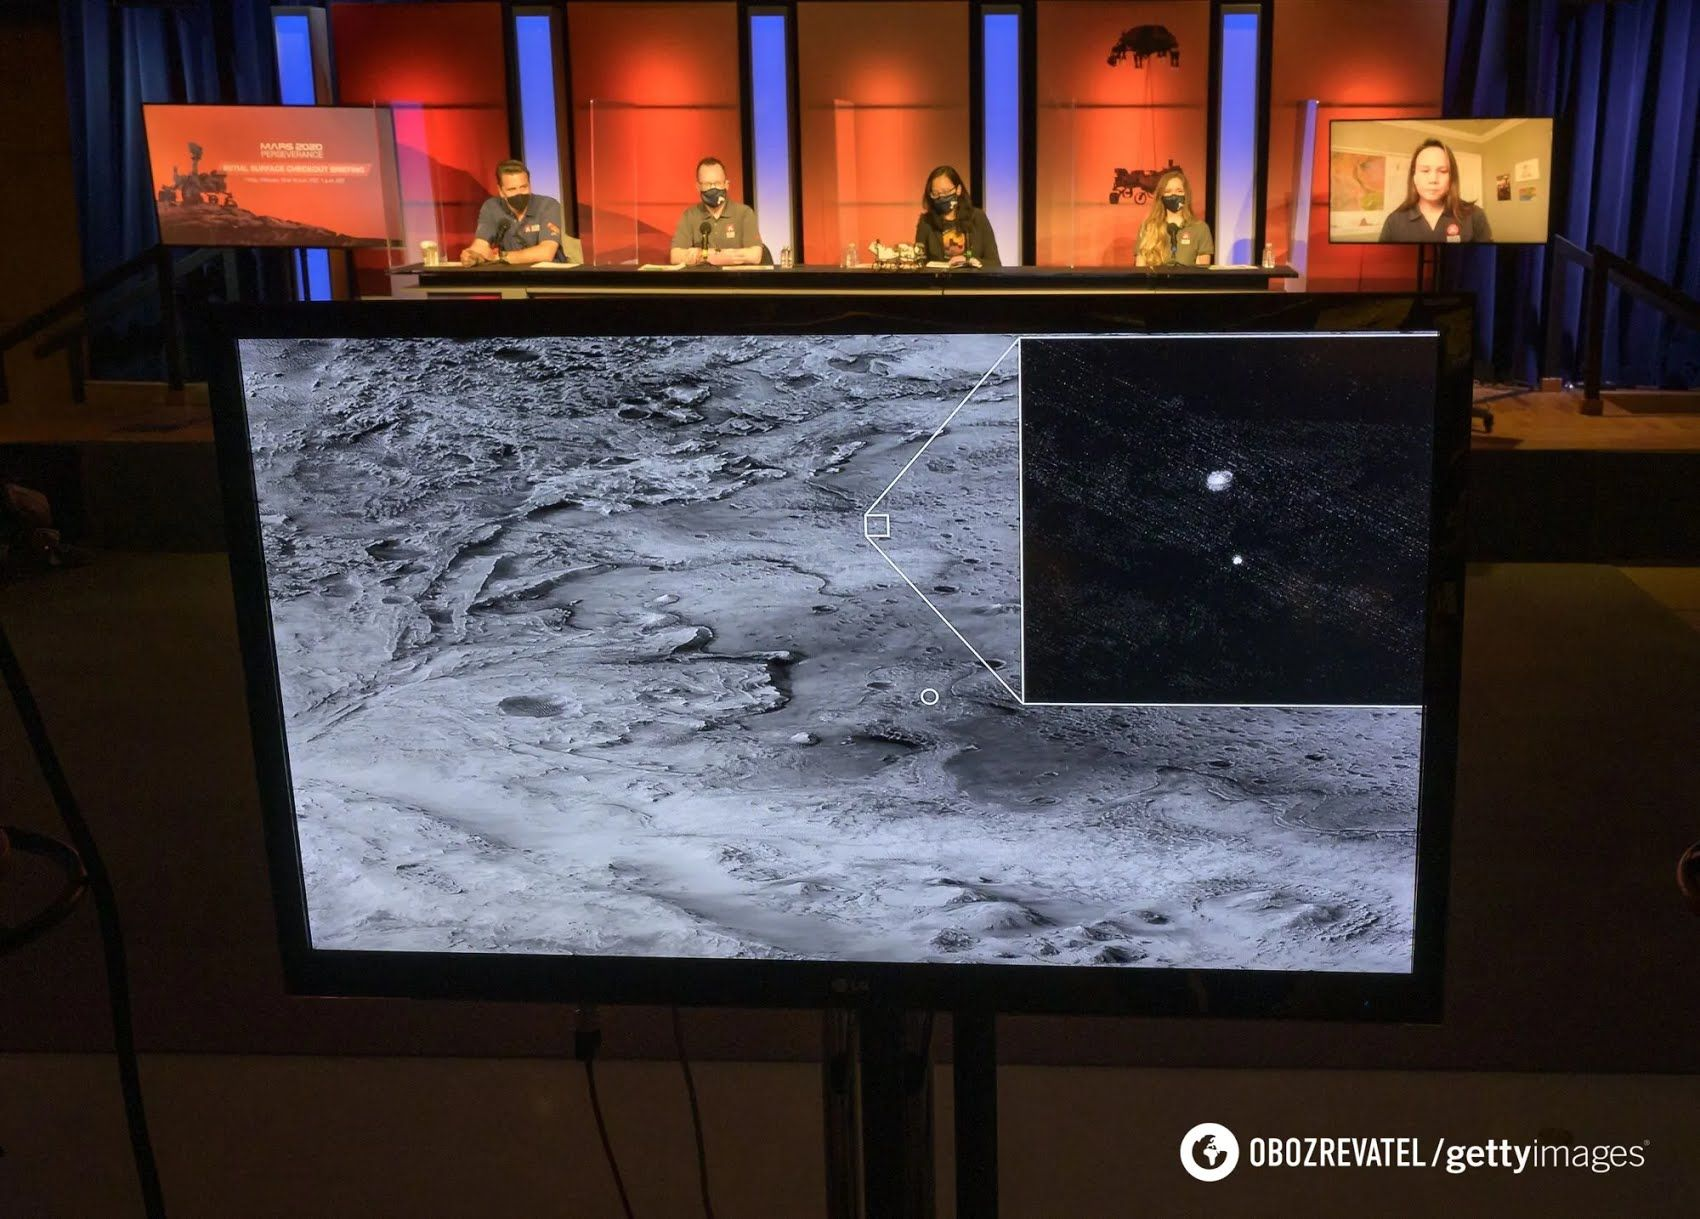 Perseverance собрал данные о климате на Марсе благодаря системе MEDA